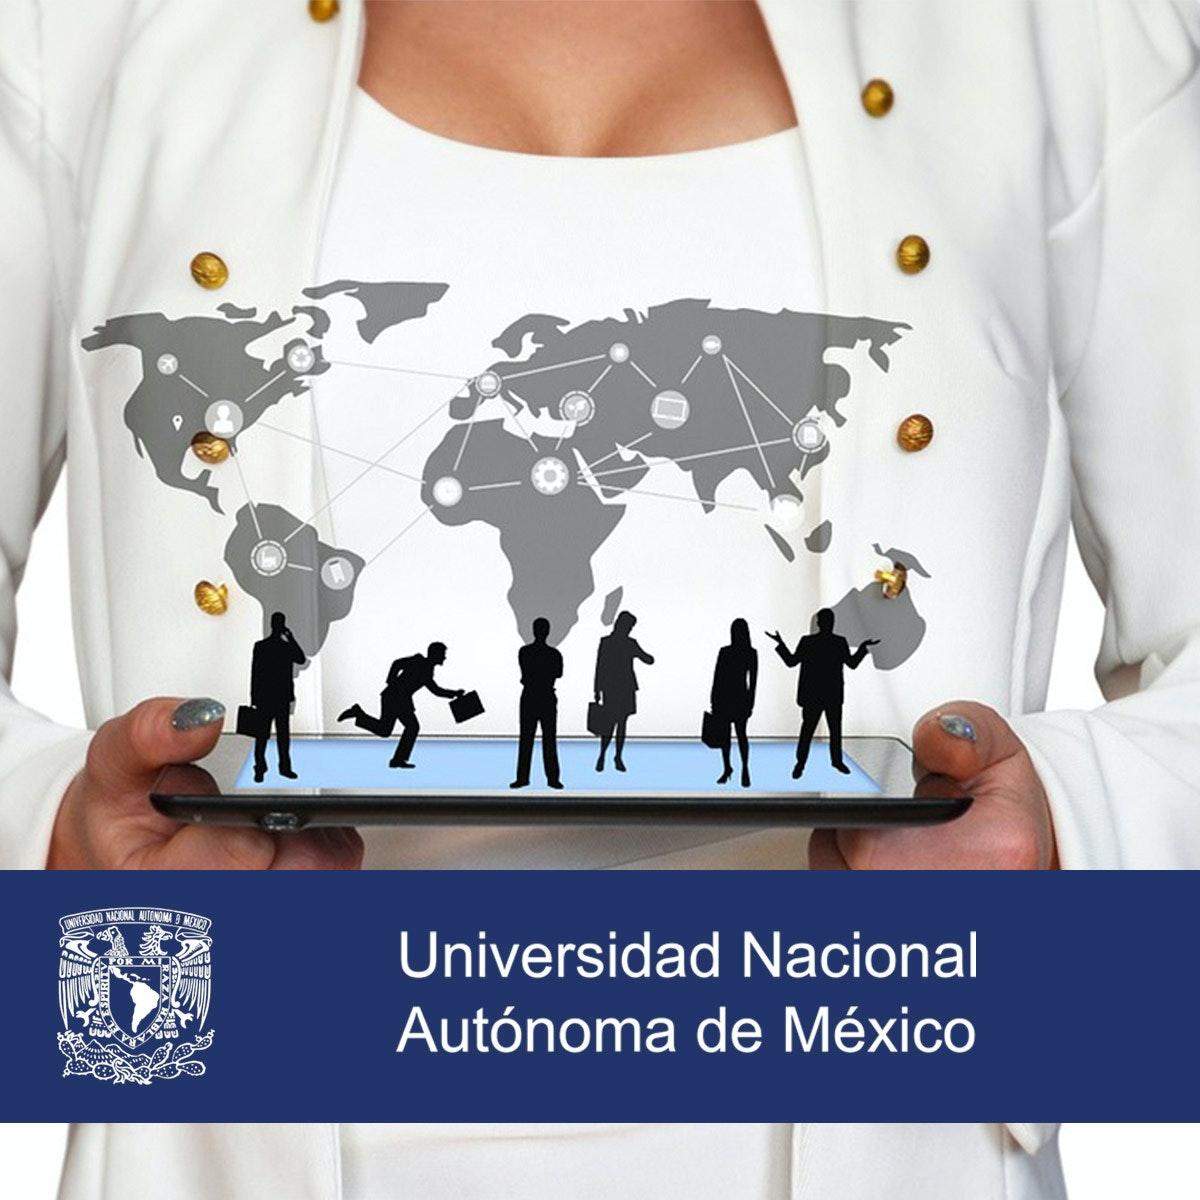 free online courses for https://d3njjcbhbojbot.cloudfront.net/api/utilities/v1/imageproxy/https://s3.amazonaws.com/coursera-course-photos/41/c3e43dce7b4a79bf829b65ba44c64d/GobiernosLocales_FINAL.jpg?auto=format%2Ccom